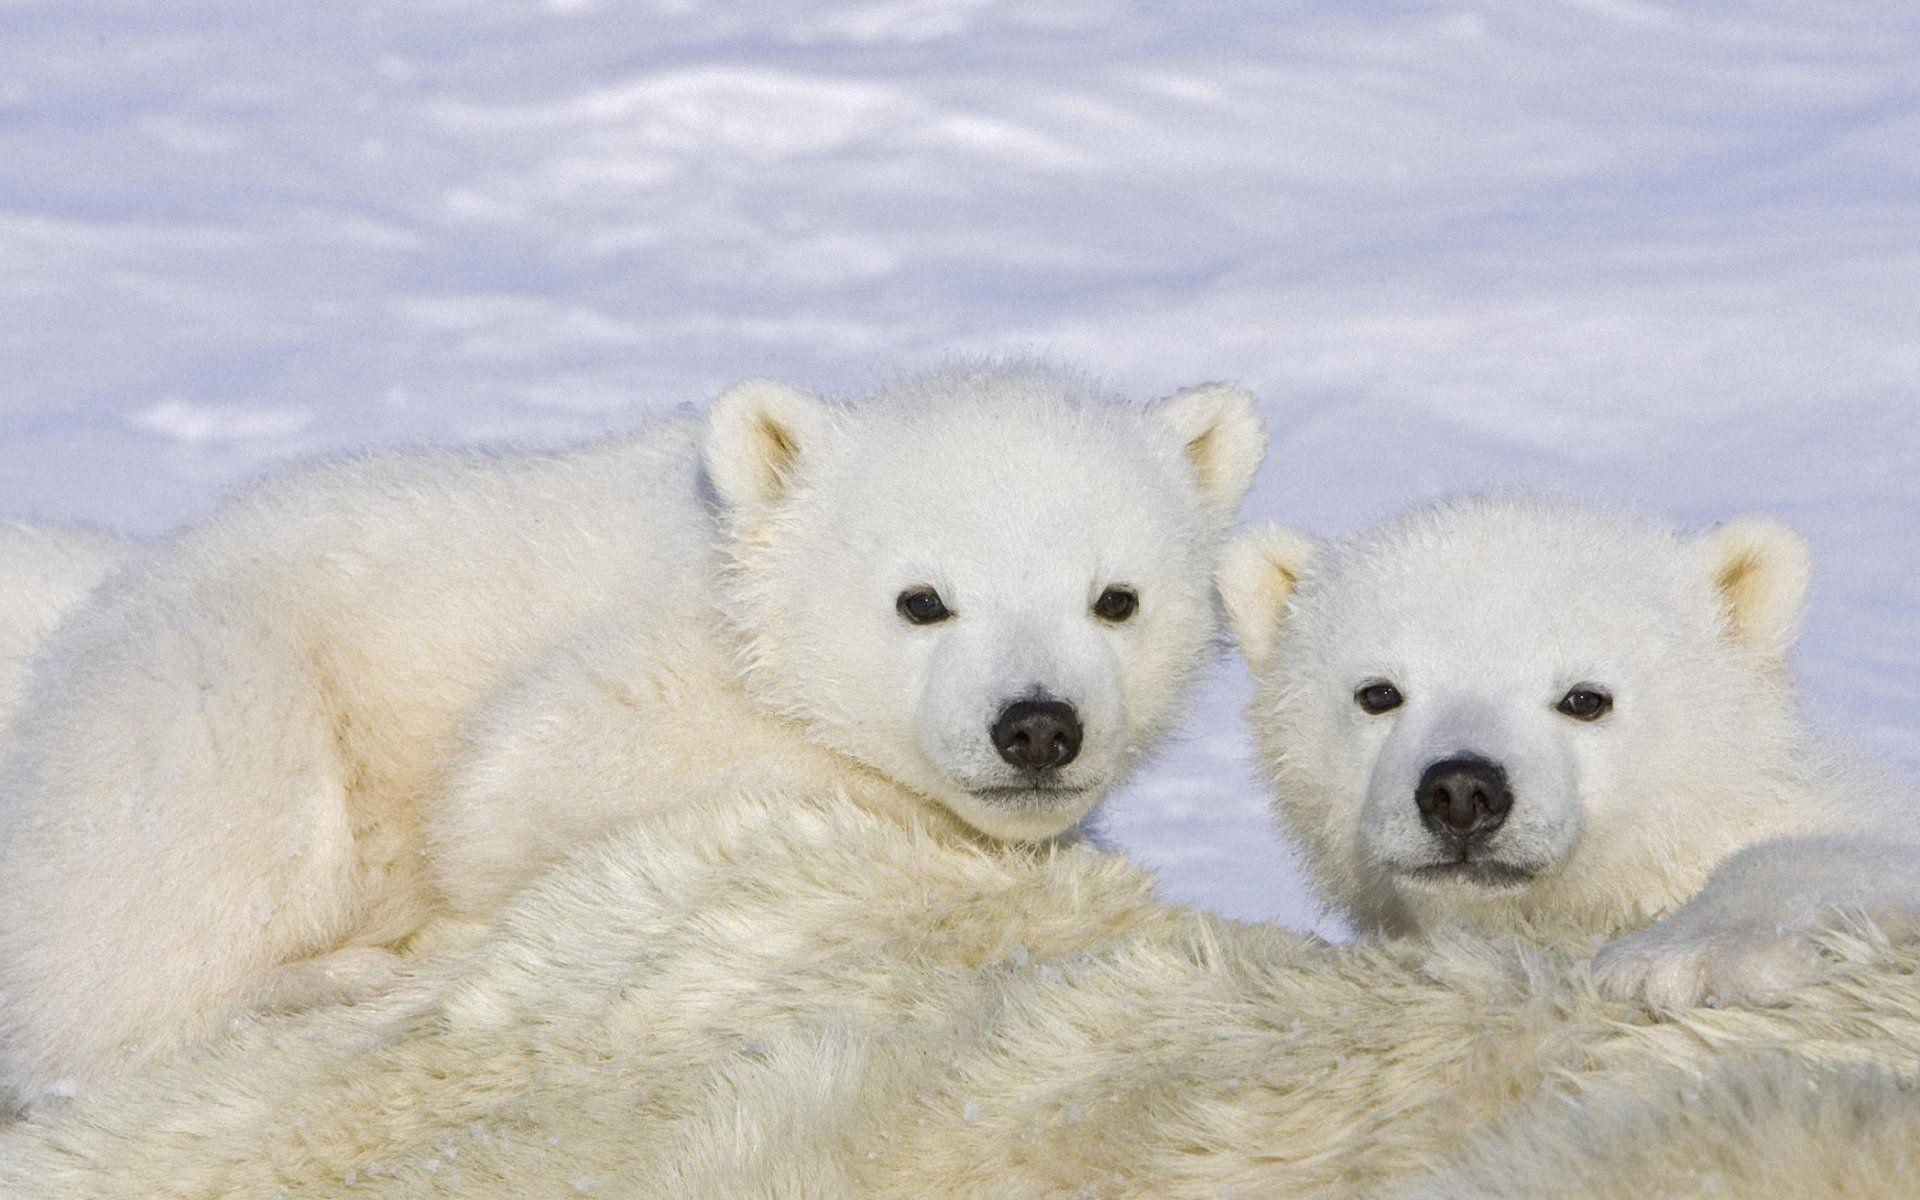 Baby Polar Bear Wallpapers Wallpaper Cave